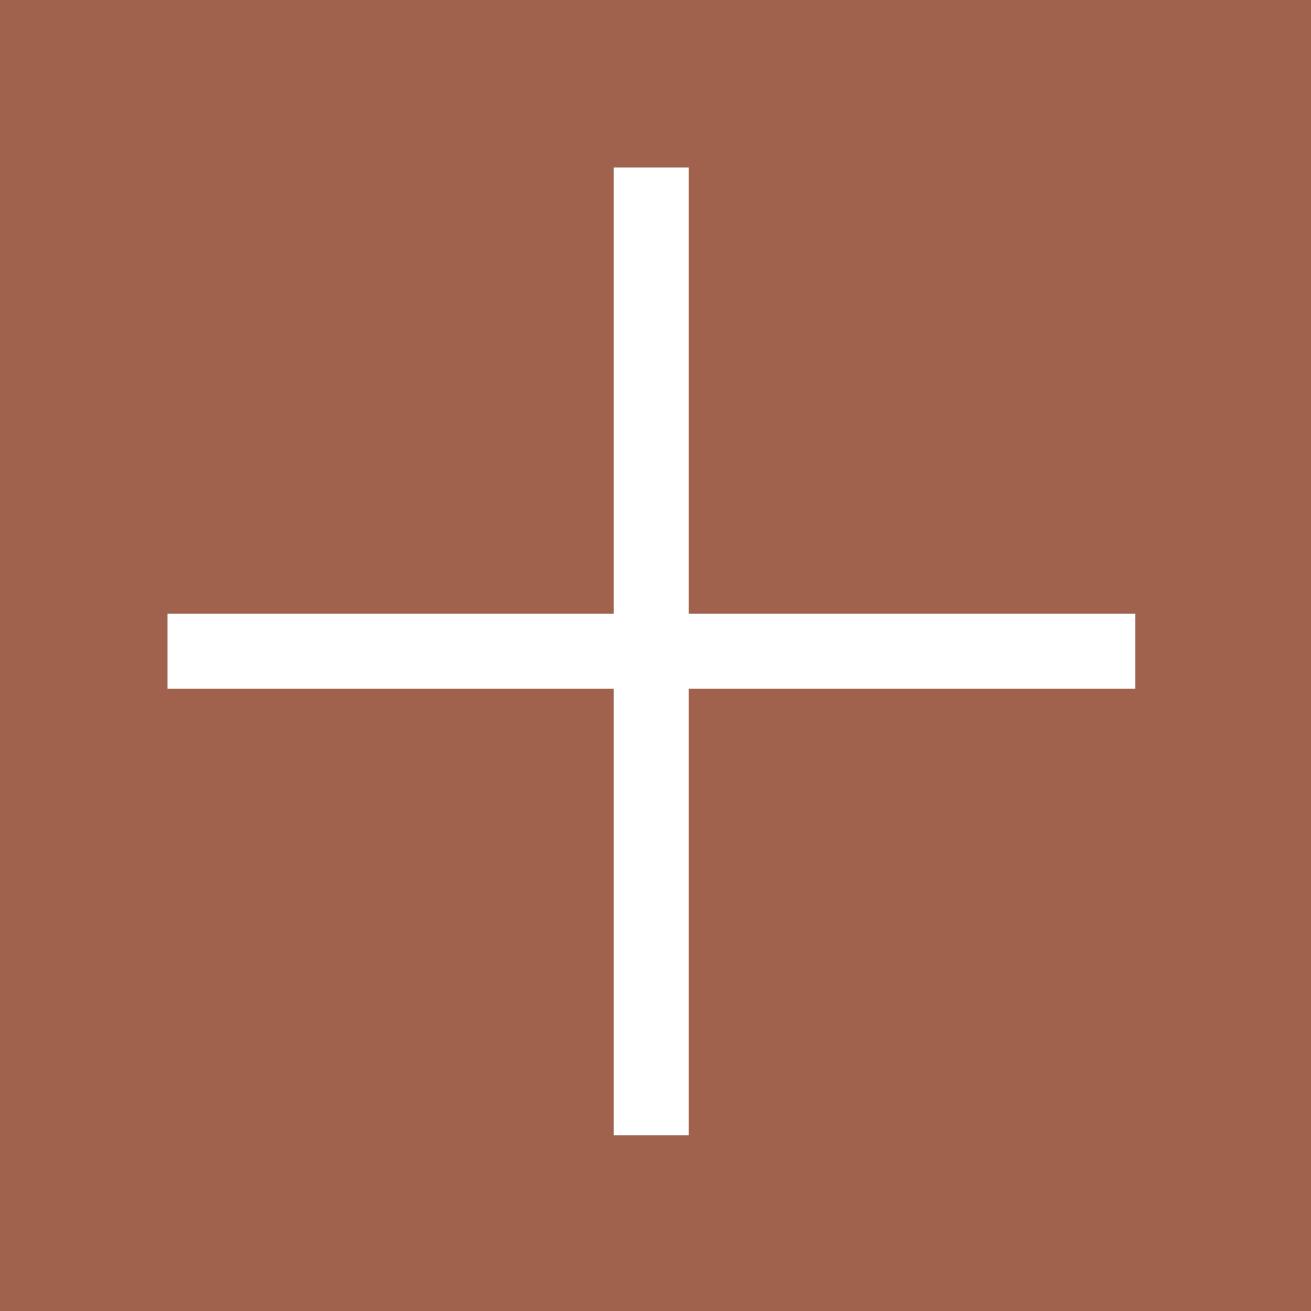 Burgerhaus_graphics-01.png